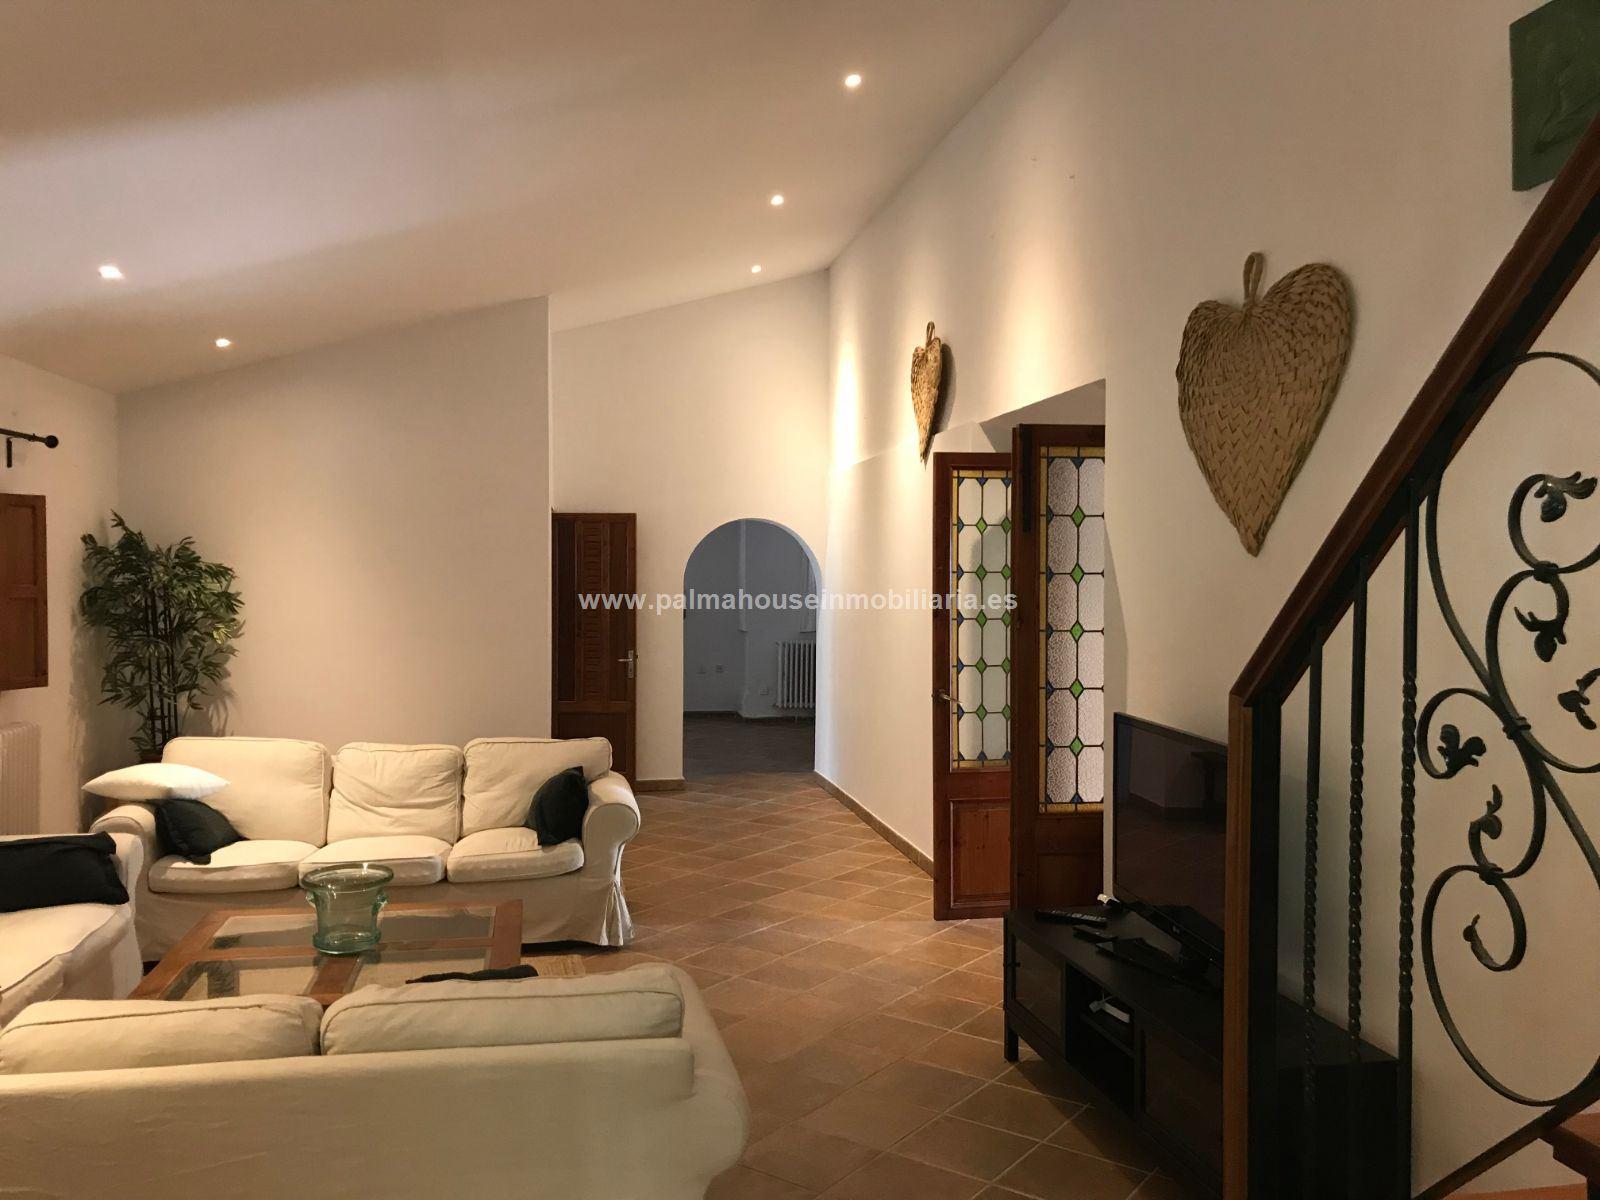 Maison  Campanet. Alquilar o comprar fabulosa villa con preciosas vistas!!